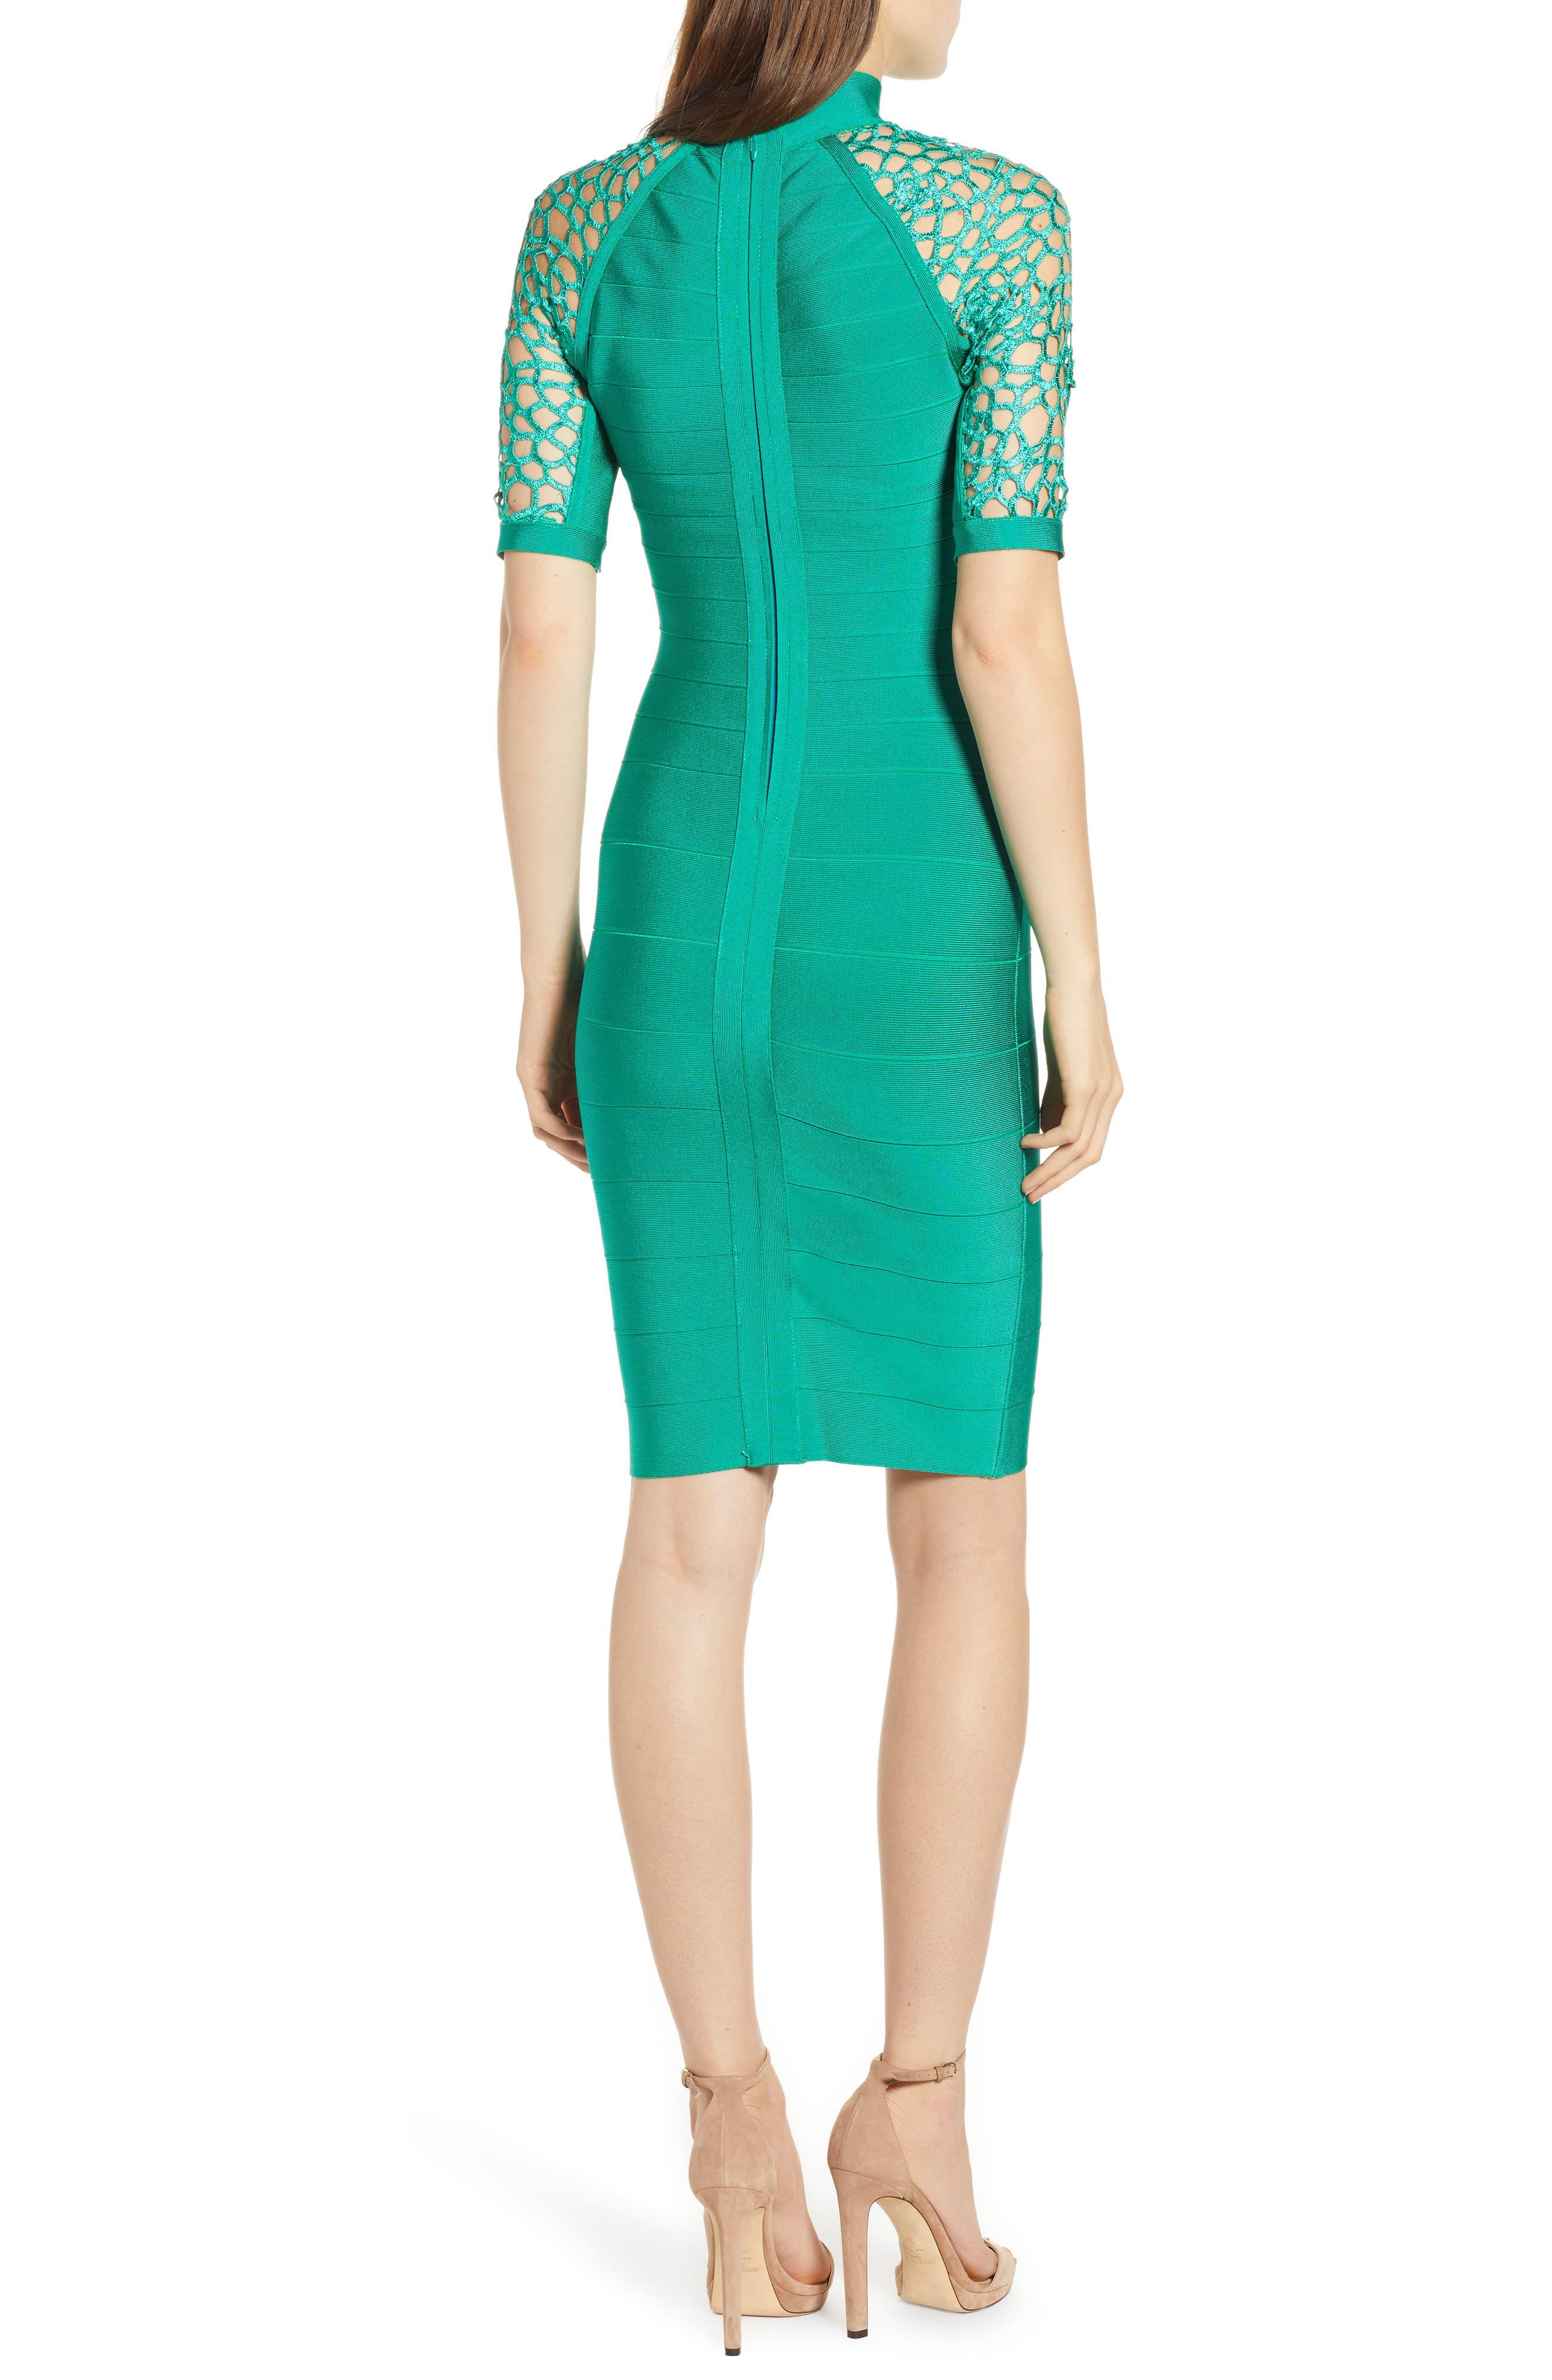 SENTIMENTAL NY,                             Bandage Body-Con Dress,                             Alternate thumbnail 2, color,                             GREEN